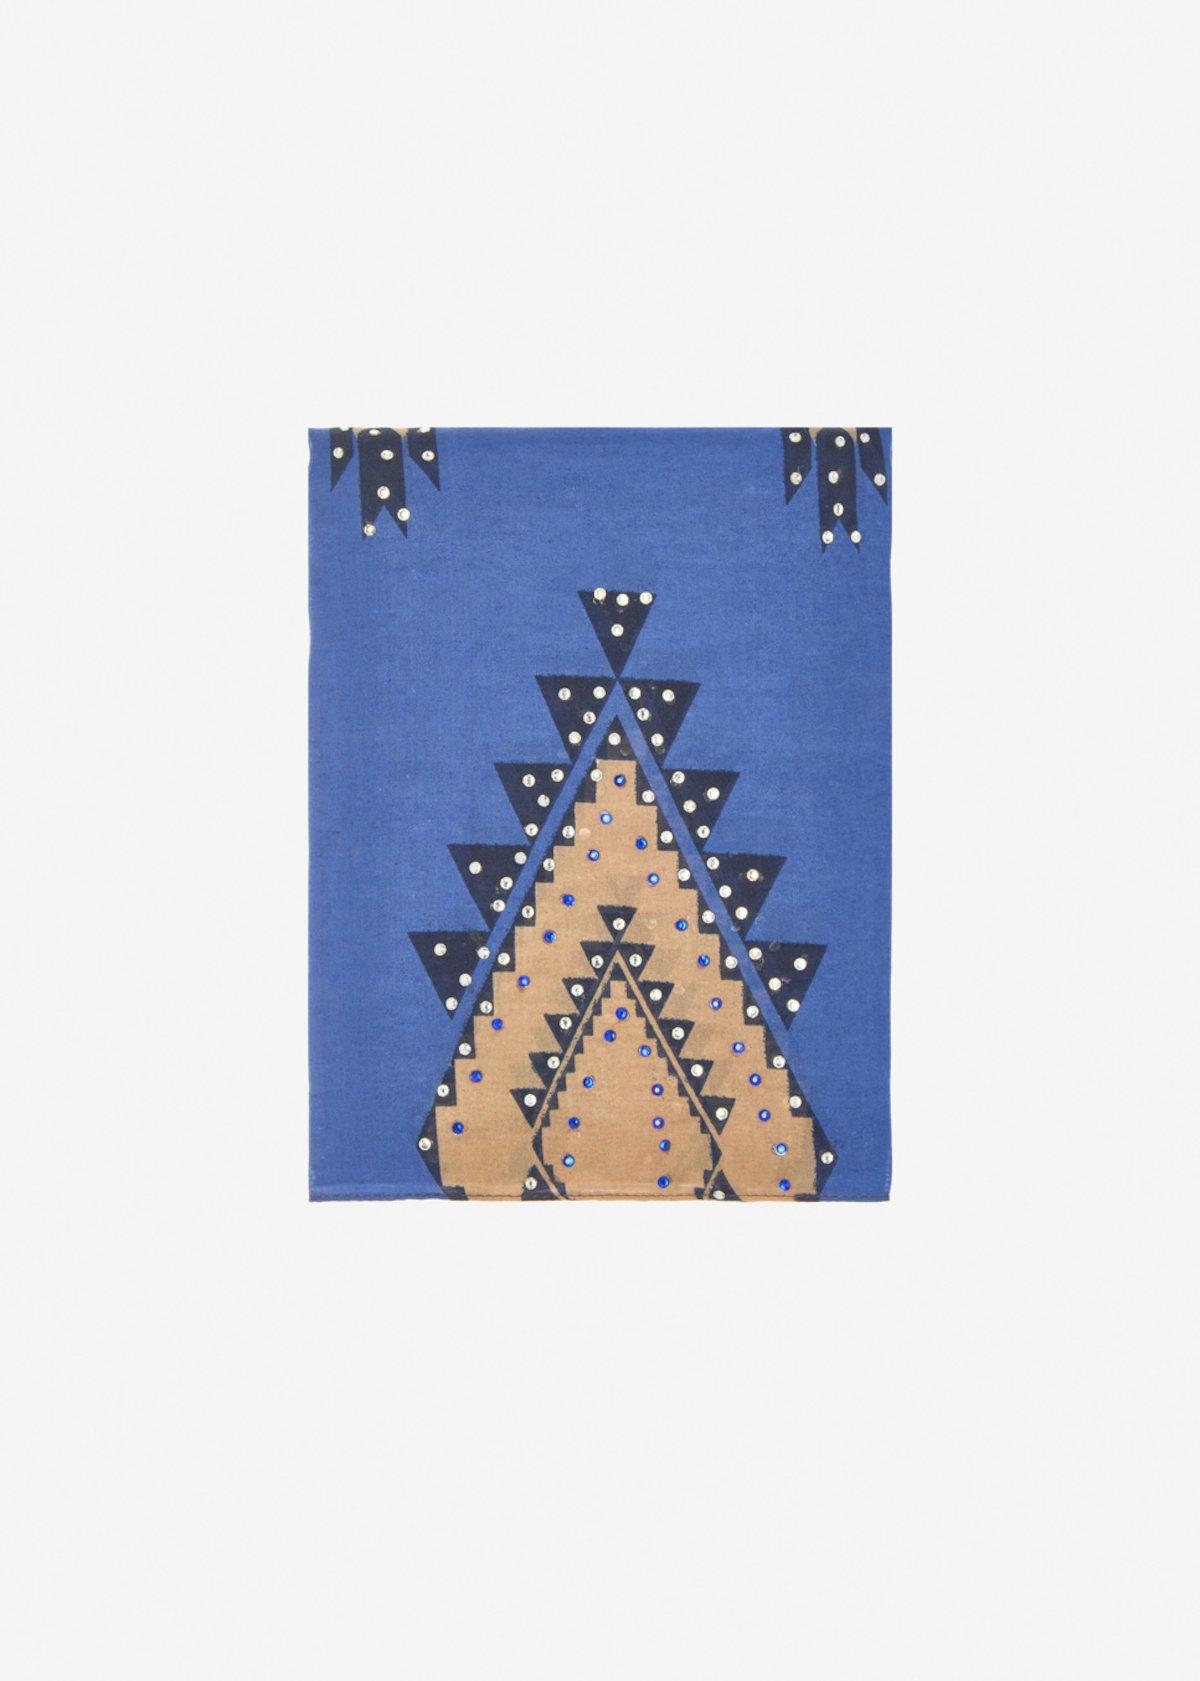 Syria scarf geometric pattern with rhinestones - Avion Fantasia